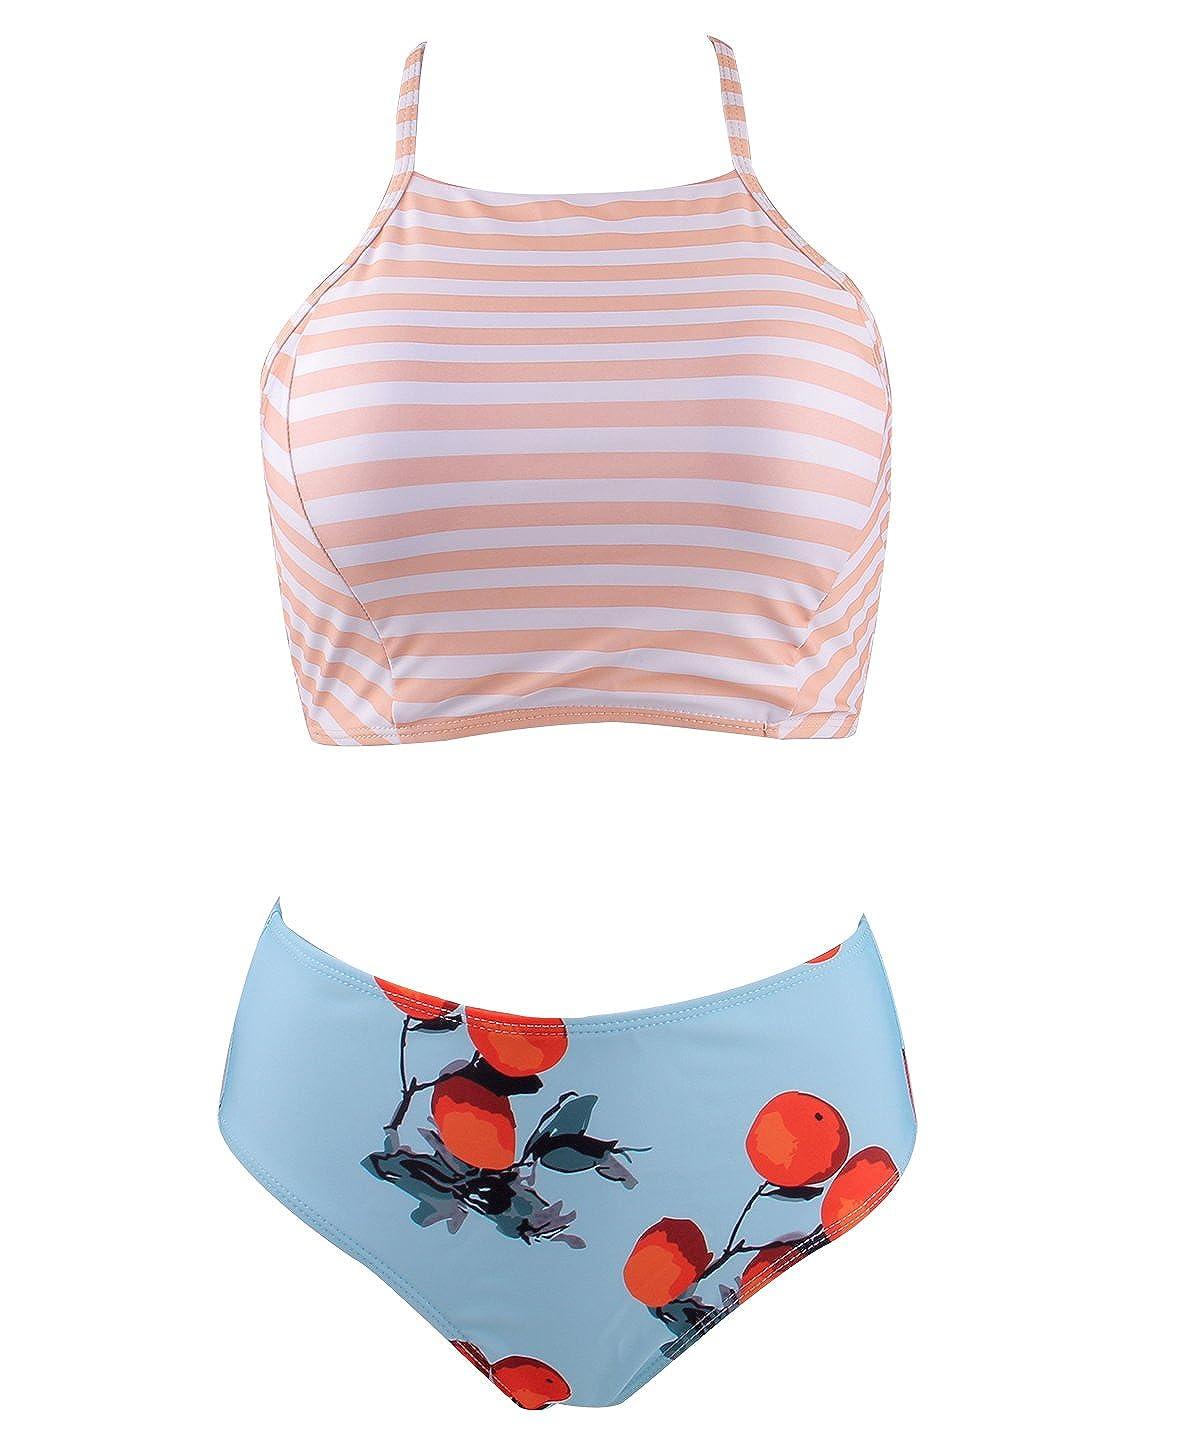 Colorful World Bathing Suits Tankini Striped Bikini for Women High Waisted Retro Swimsuit Two Piece USA-BKN-090